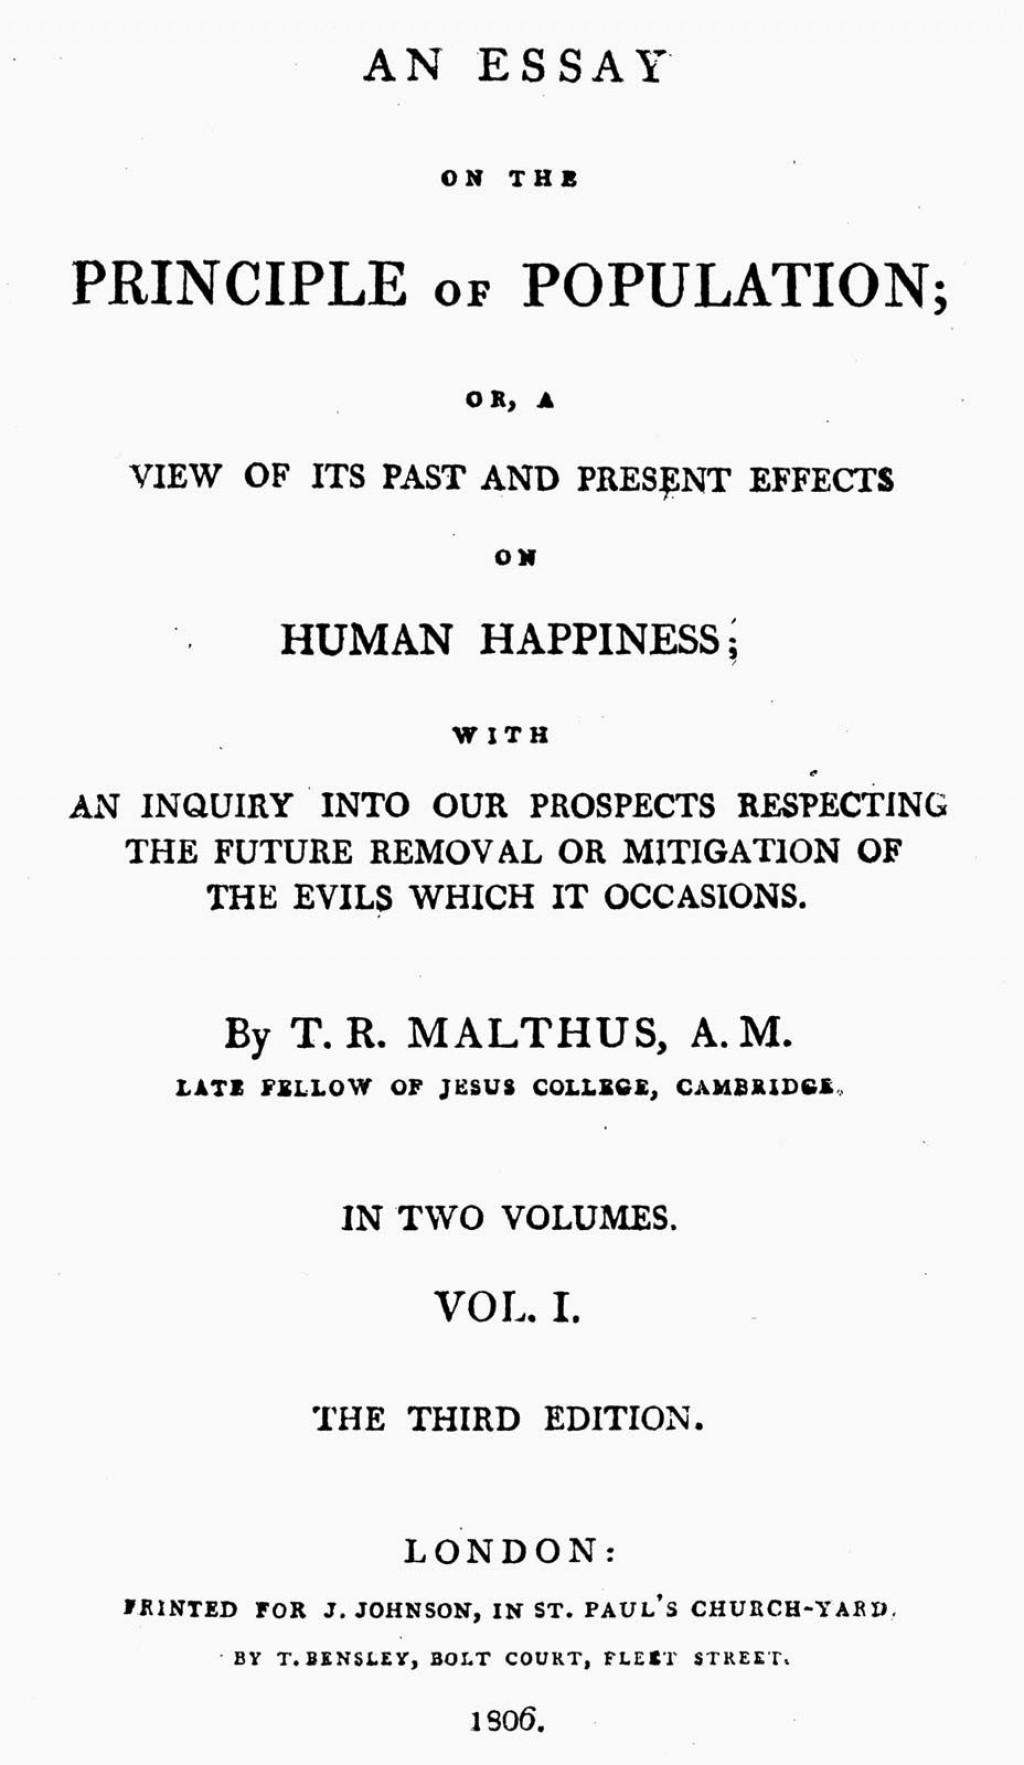 017 Thomas Malthus Essay On The Principle Of Population Stupendous After Reading Malthus's Principles Darwin Got Idea That Ap Euro Large